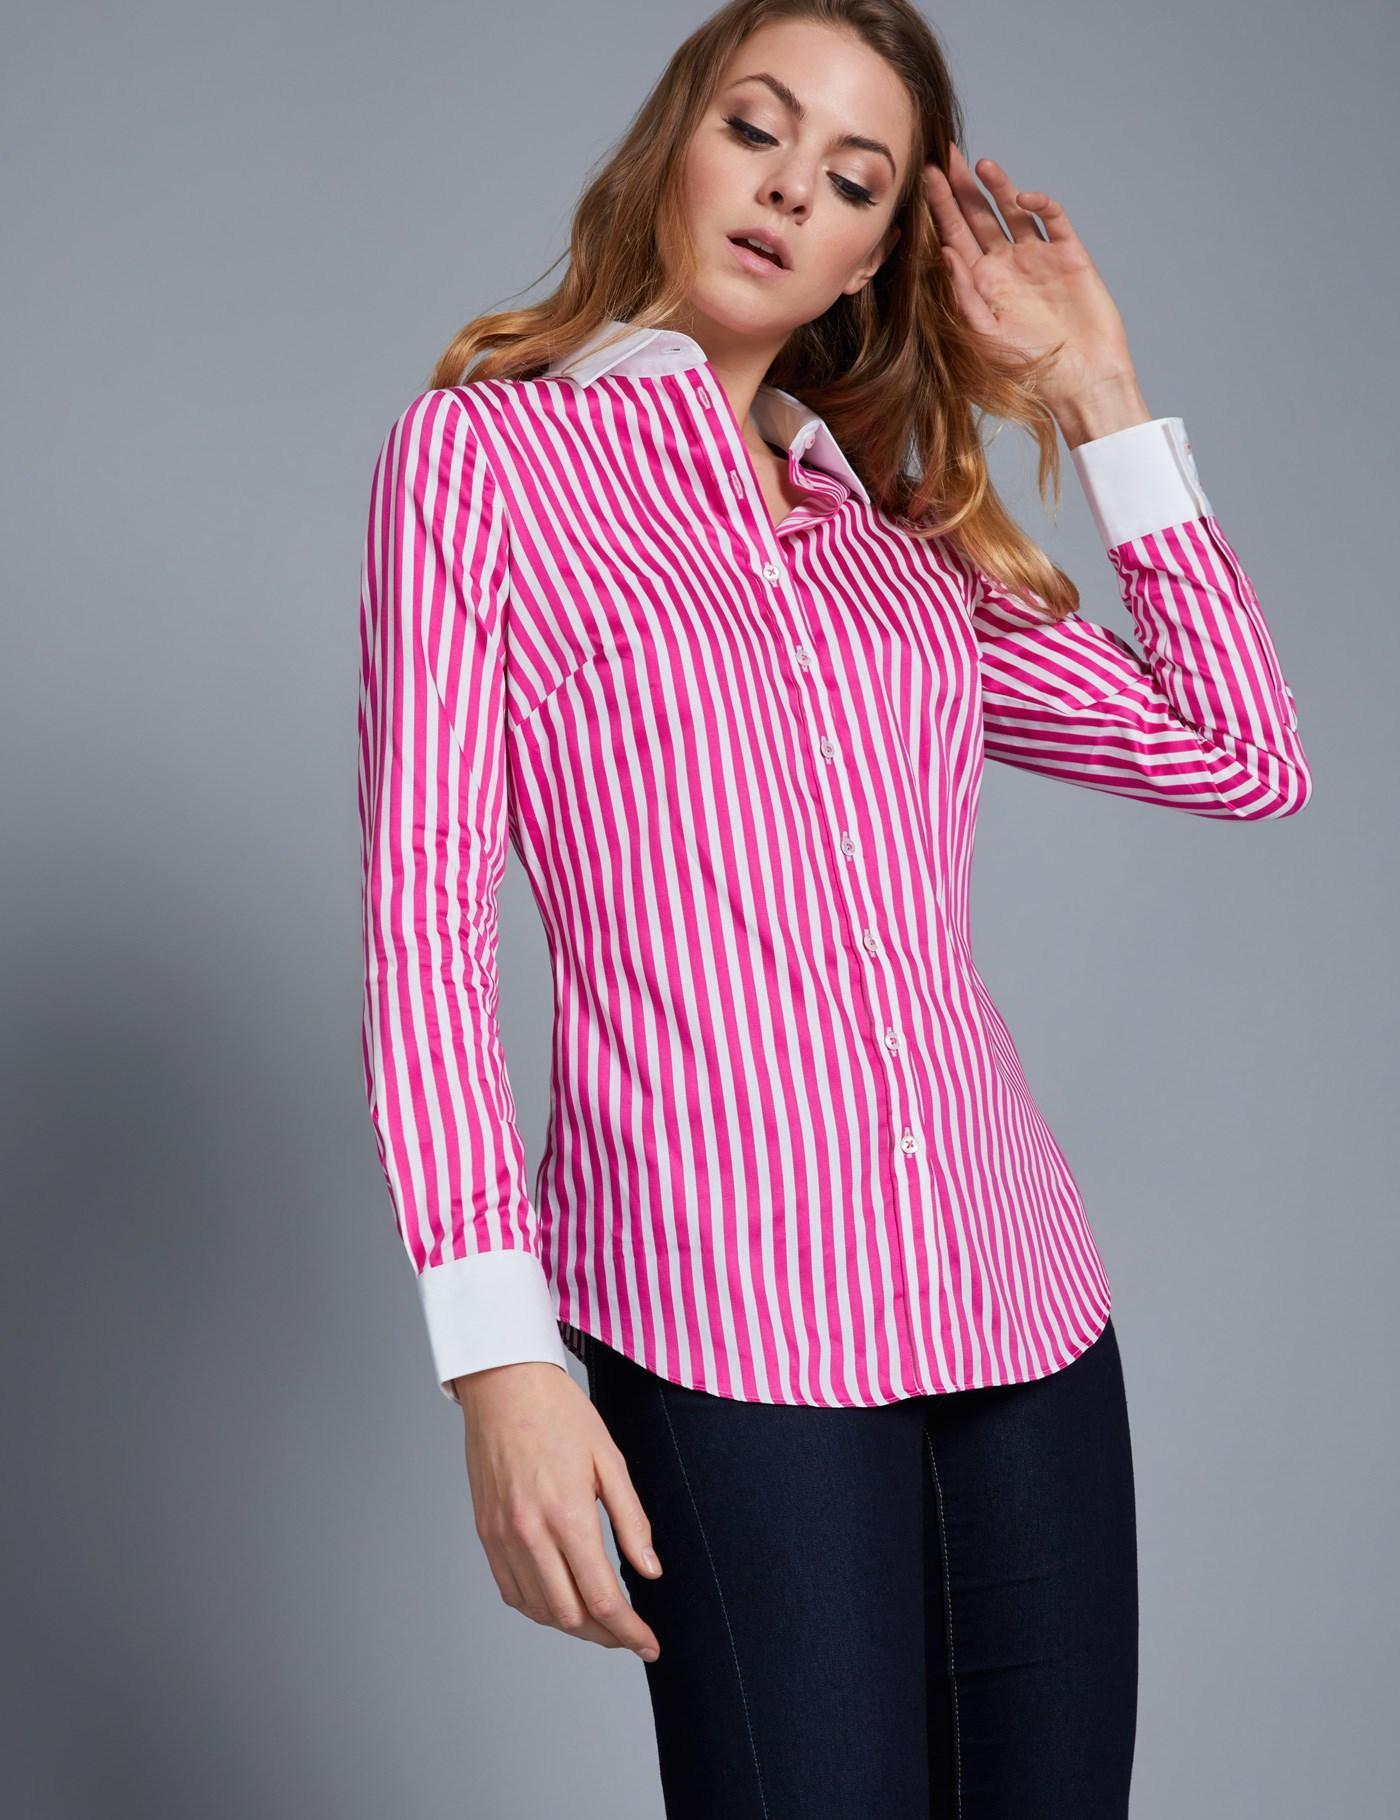 a7e51e2e2e Lyst - Hawes   Curtis White   Pink Bengal Stripe Semi Fitted Shirt ...